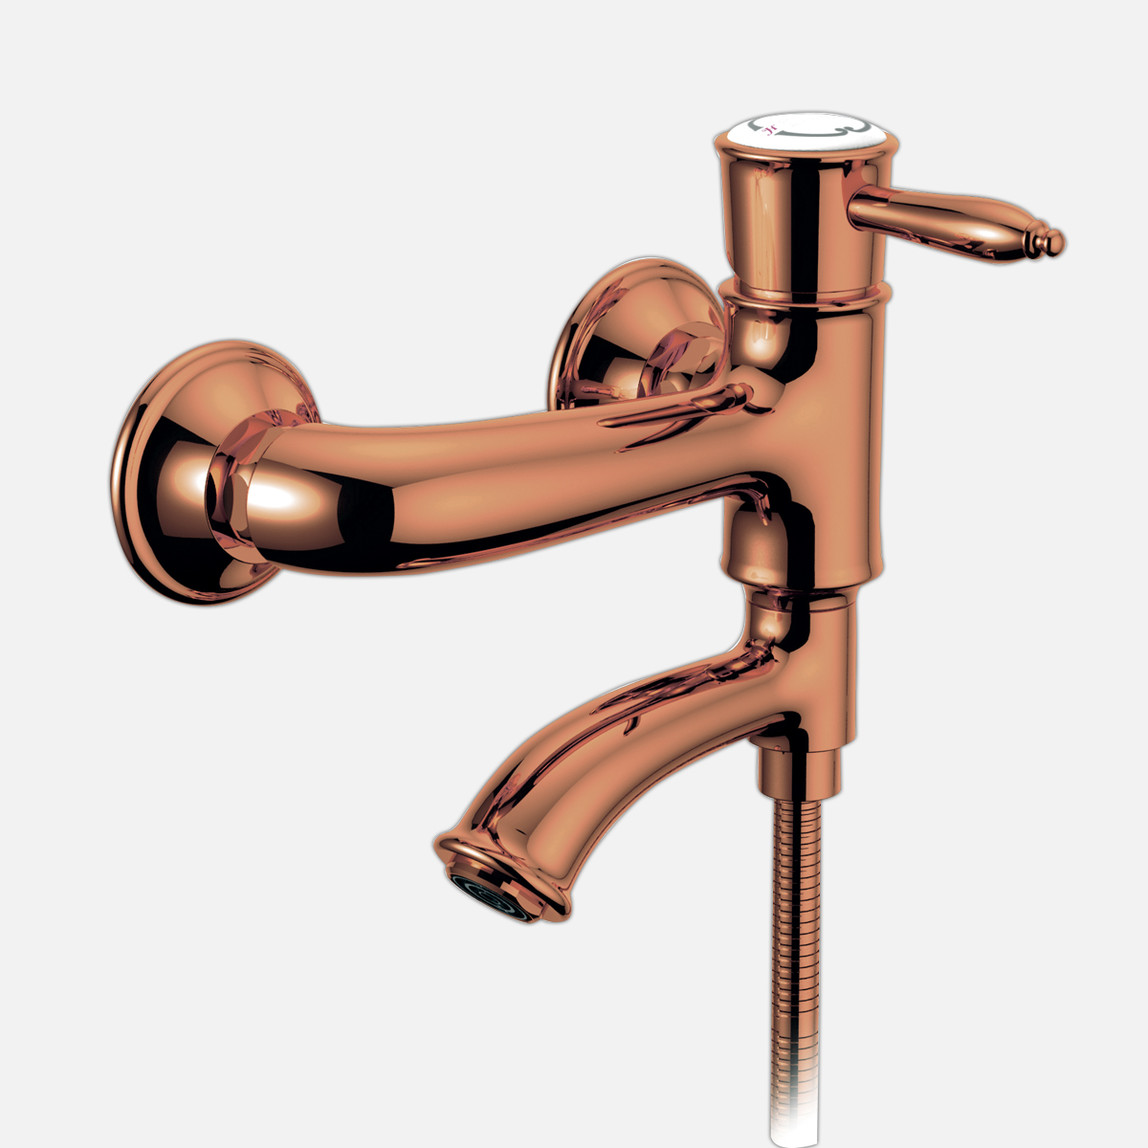 Penta Rose Banyo Bataryası